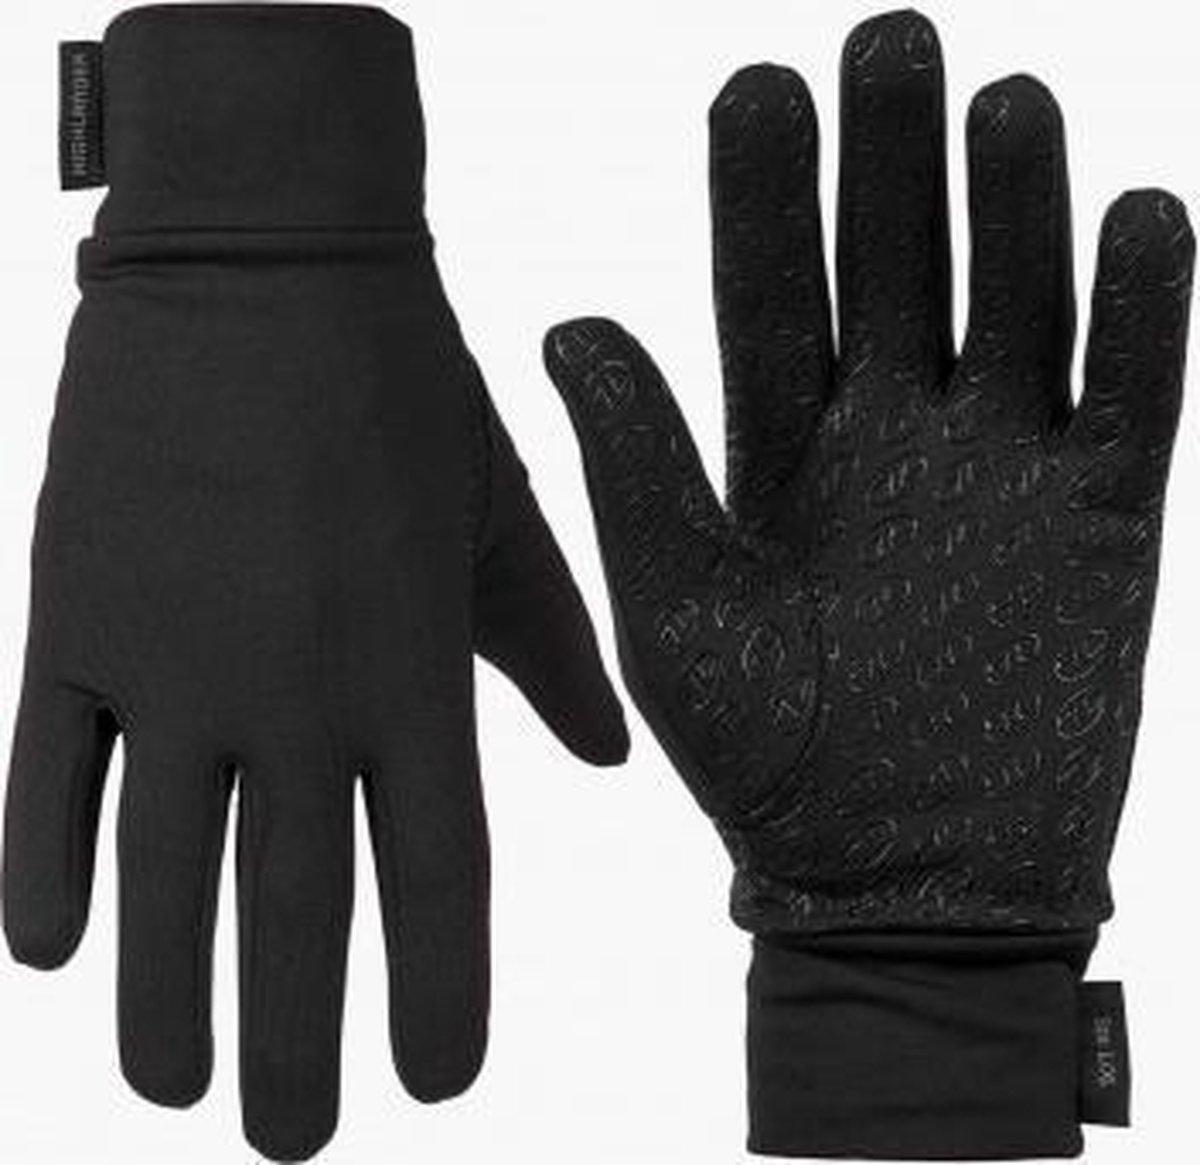 Highlander - Stretch grip handschoenen - Zwart - Maat S/M